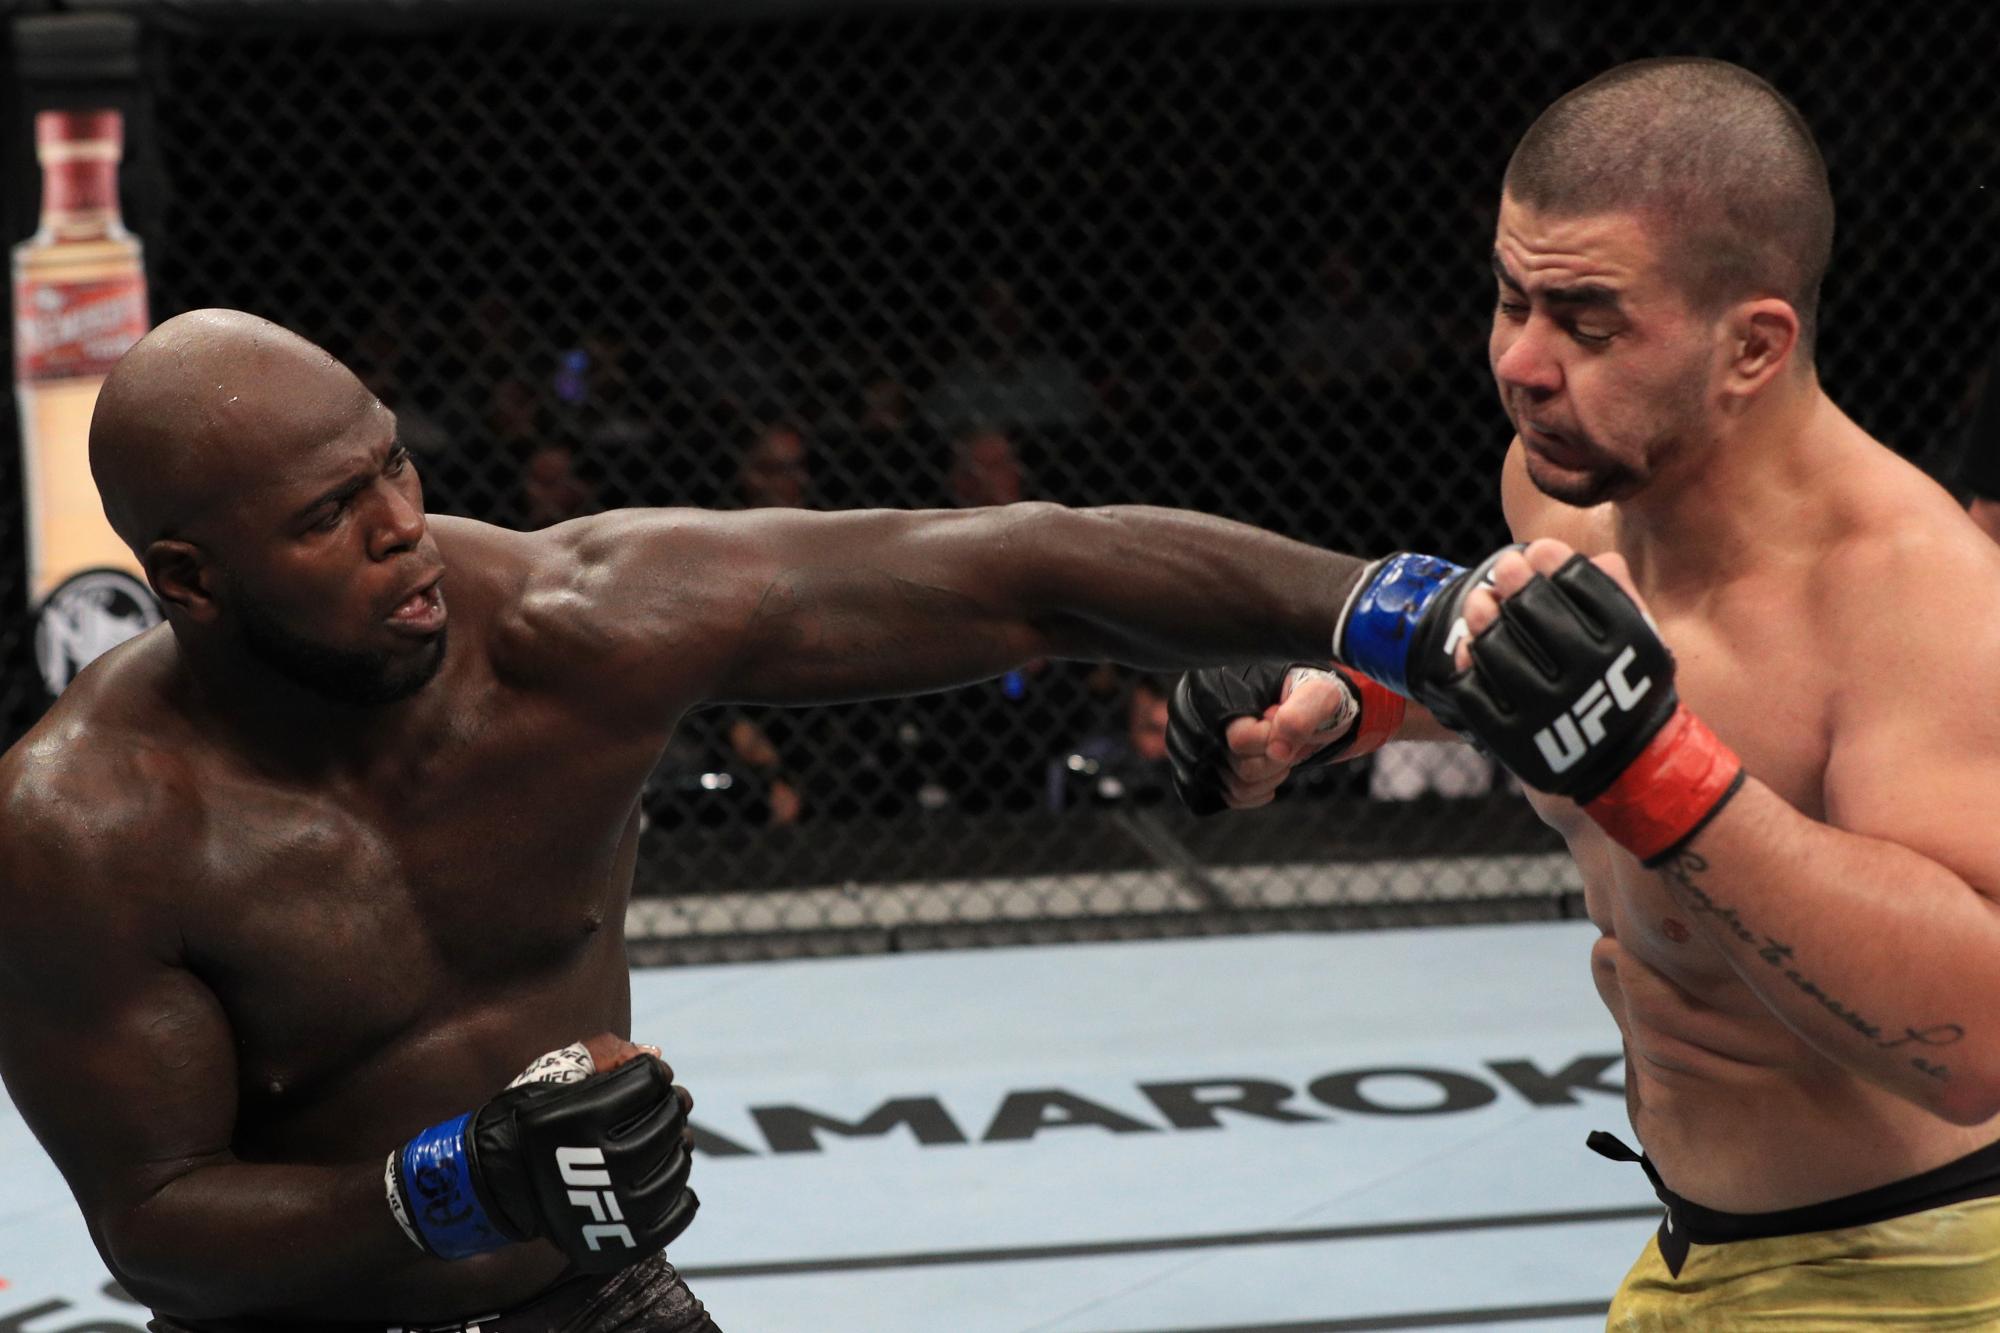 Jairzinho Rozenstruick makes a quick turnaround to fight Alistair Overeem at UFC DC - Jairzinho Rozenstruick